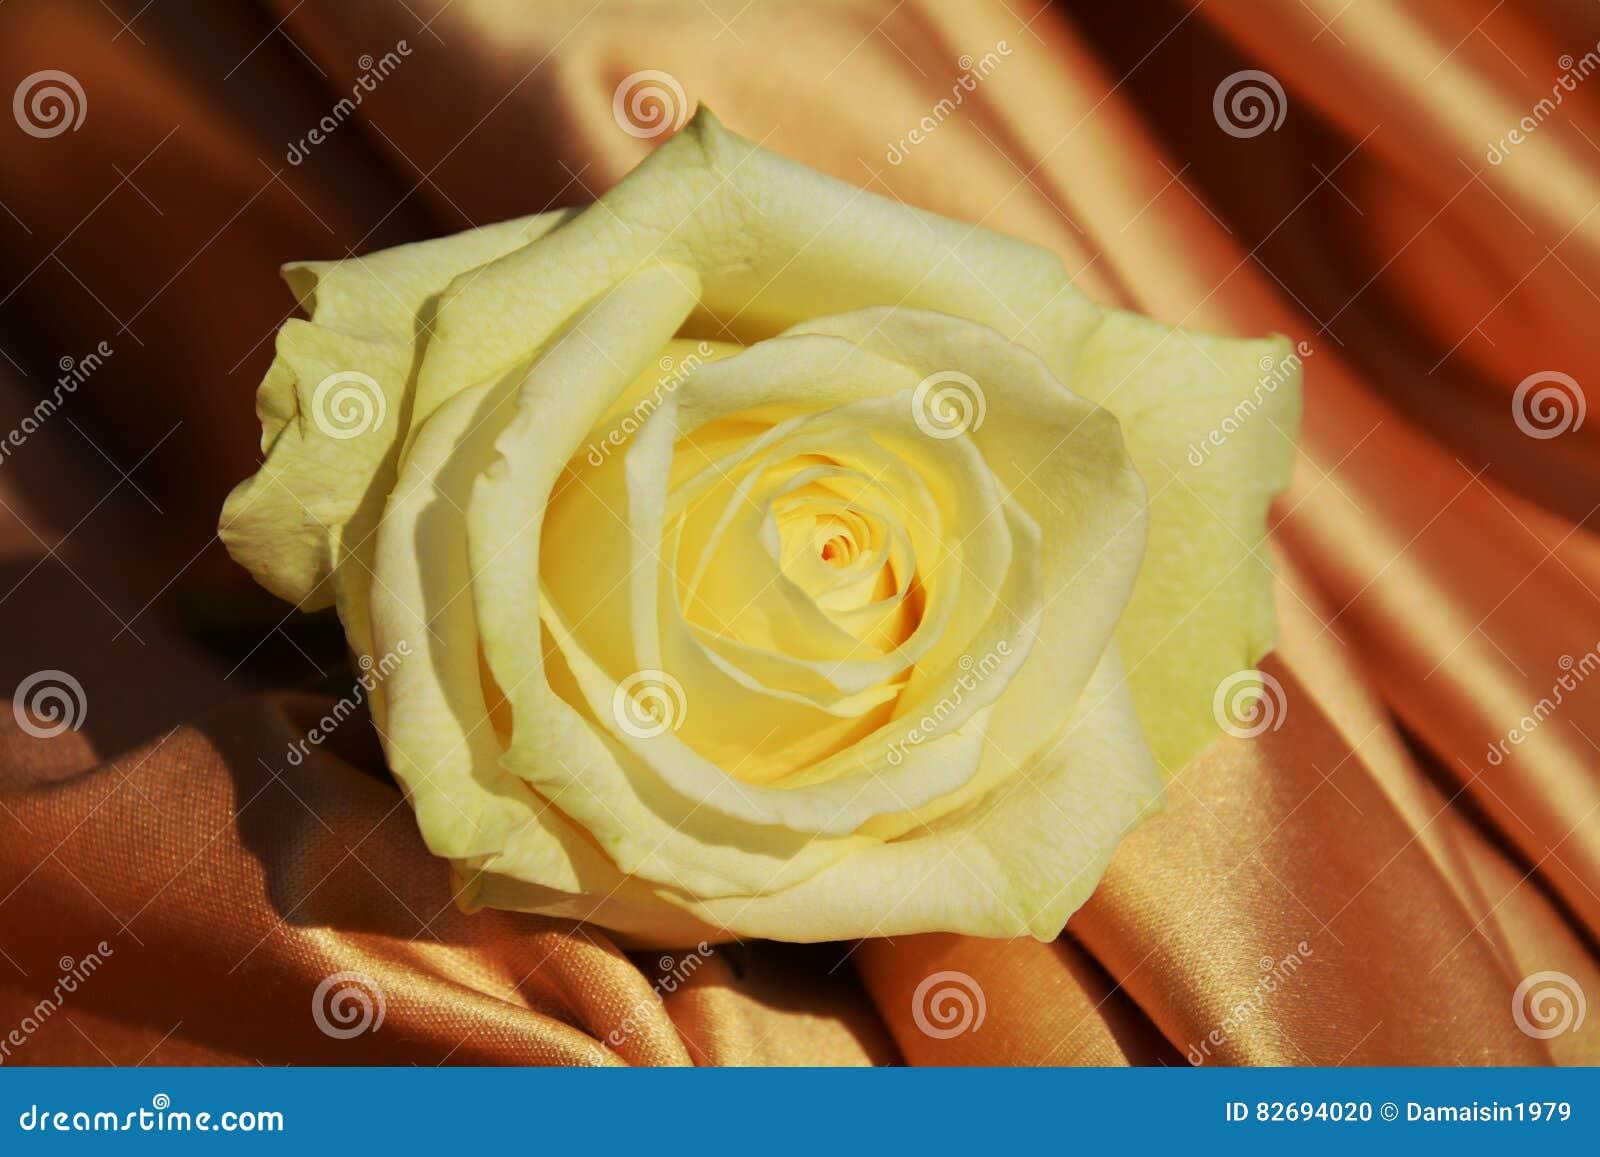 Yellow rose on an elegant fabric